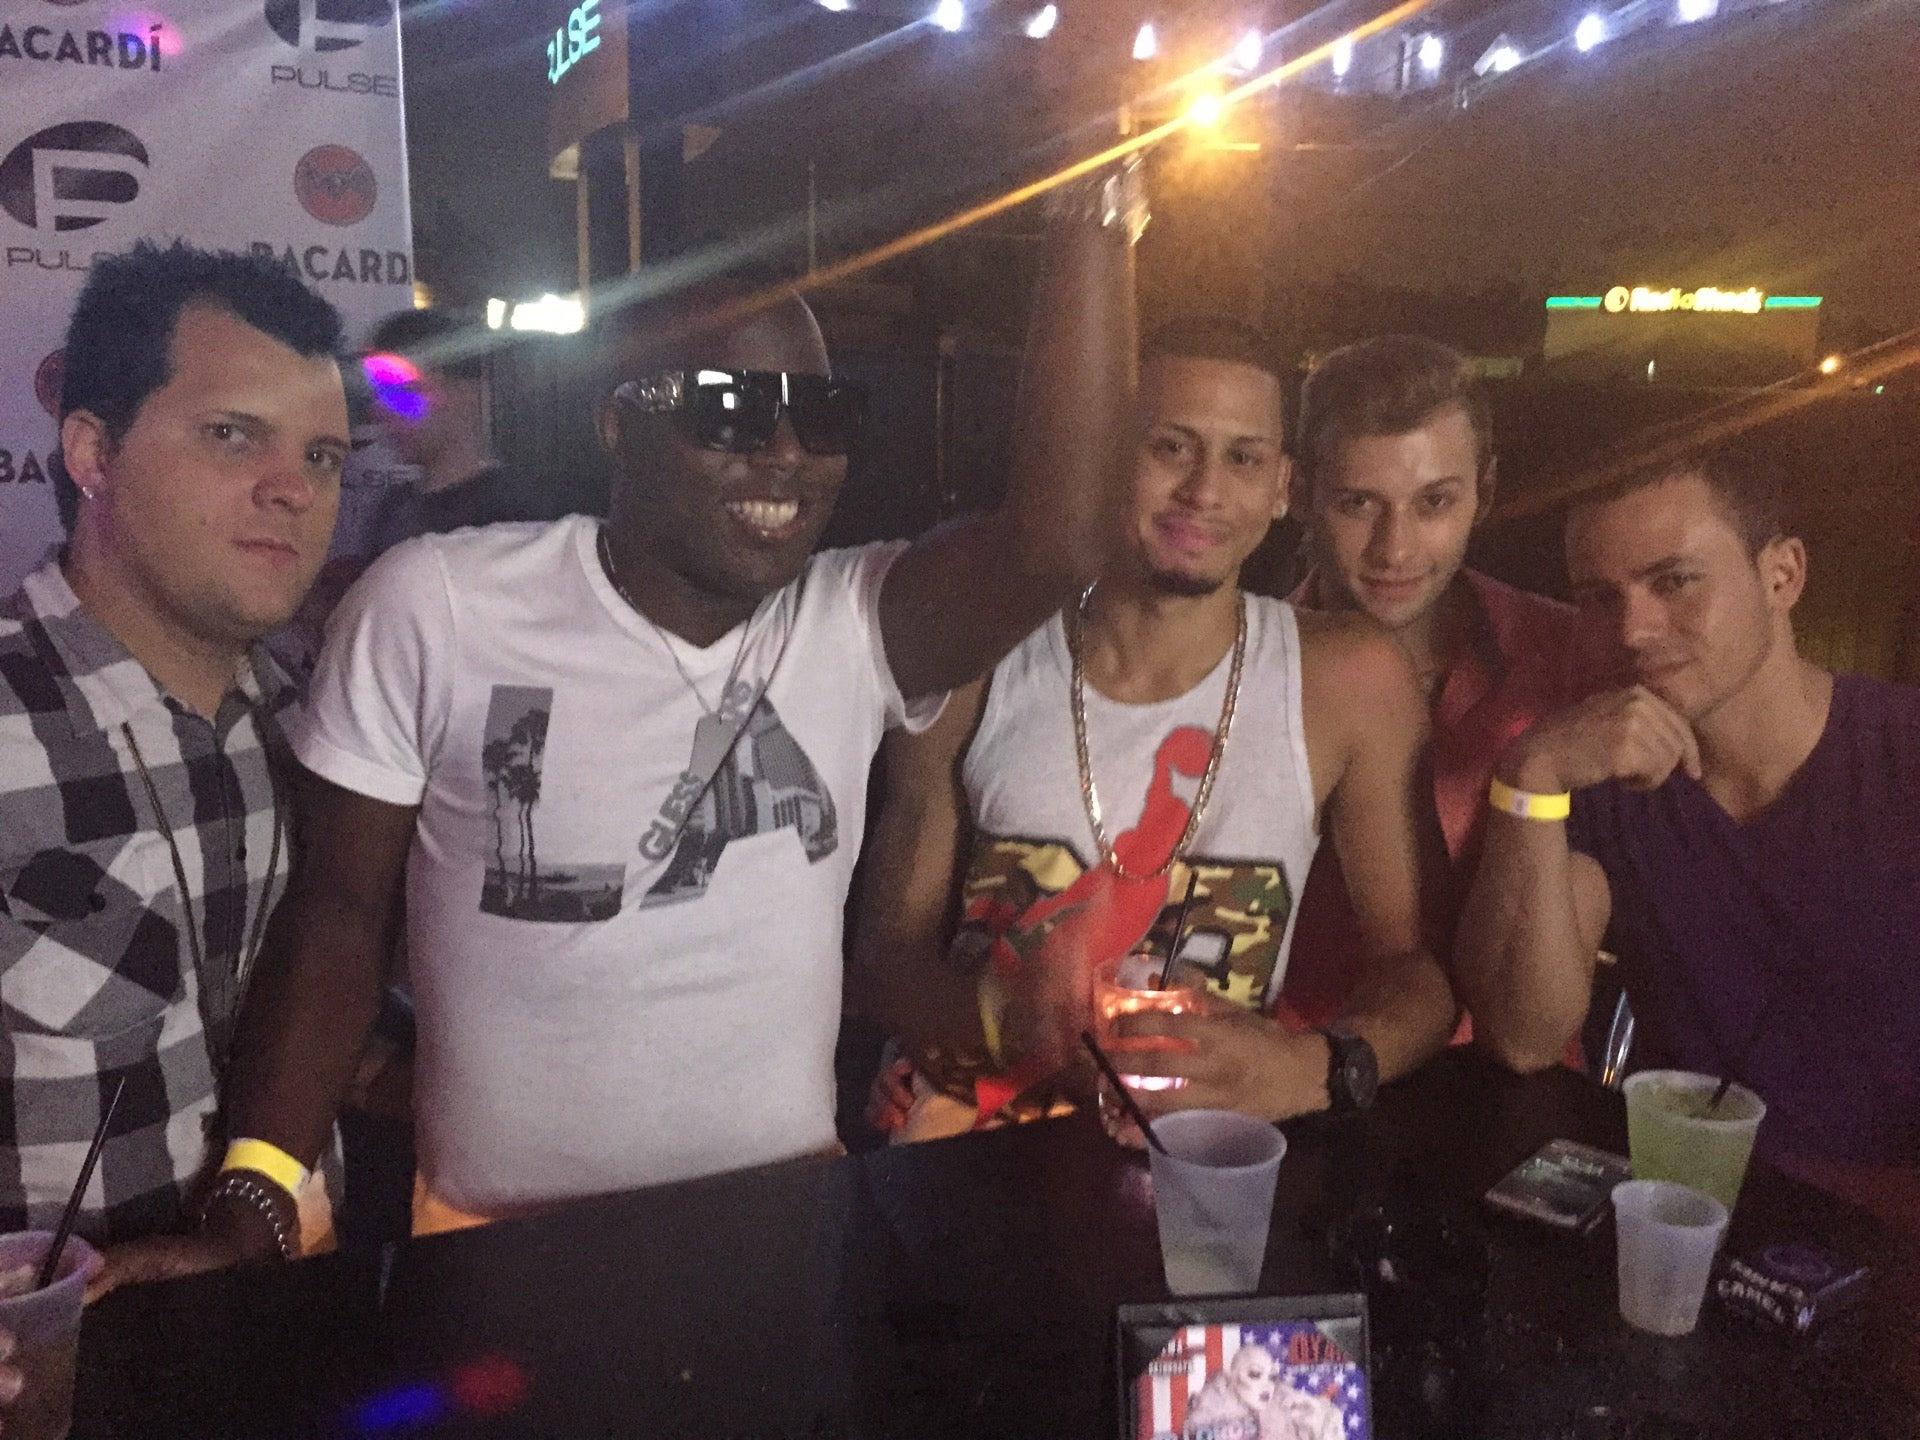 Pulse,beer,fratboys,gay bar,liquor,martini bar